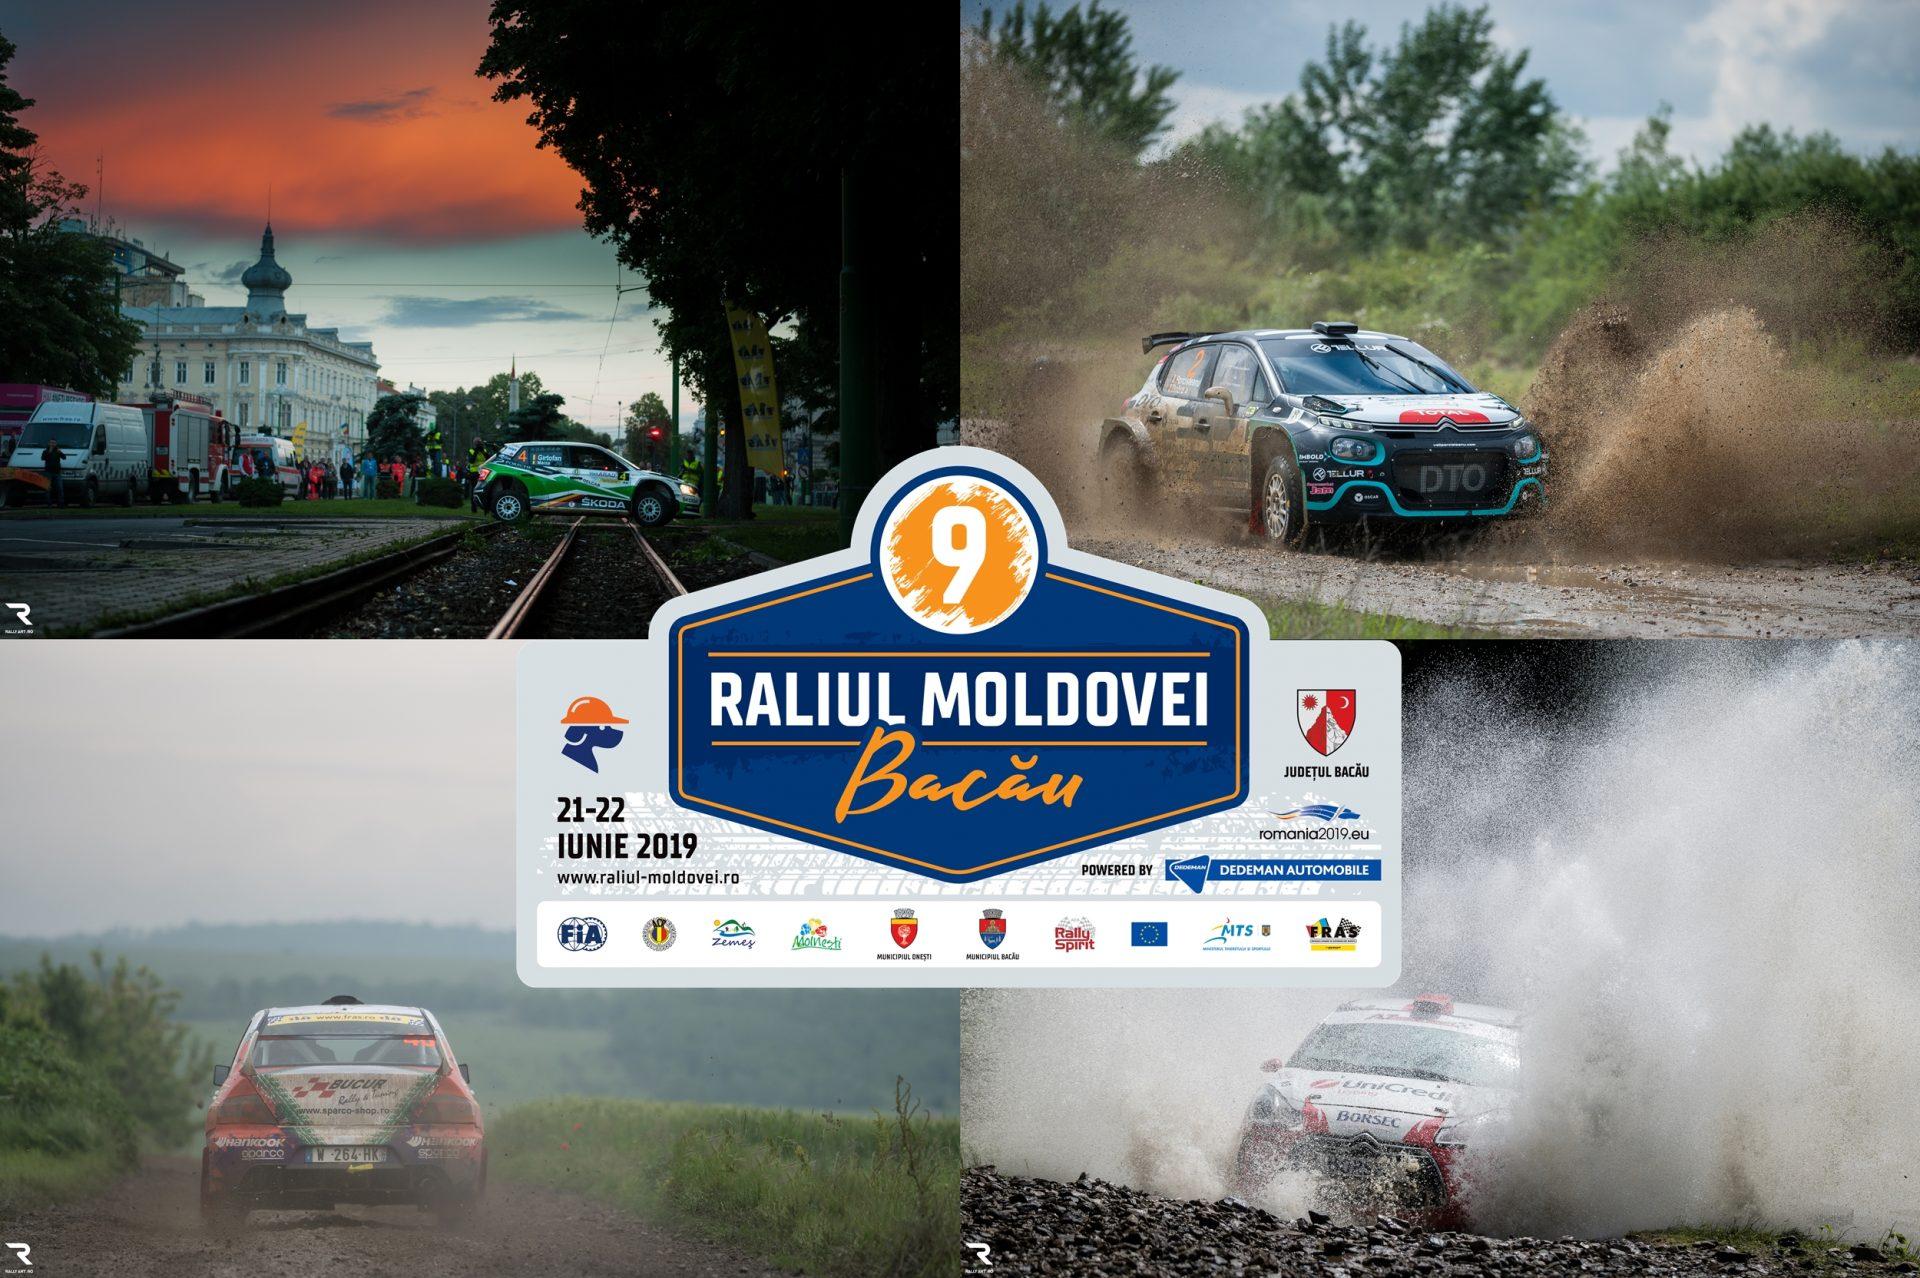 Raliul Moldovei 2019 – Lupta se va da in absenta liderului